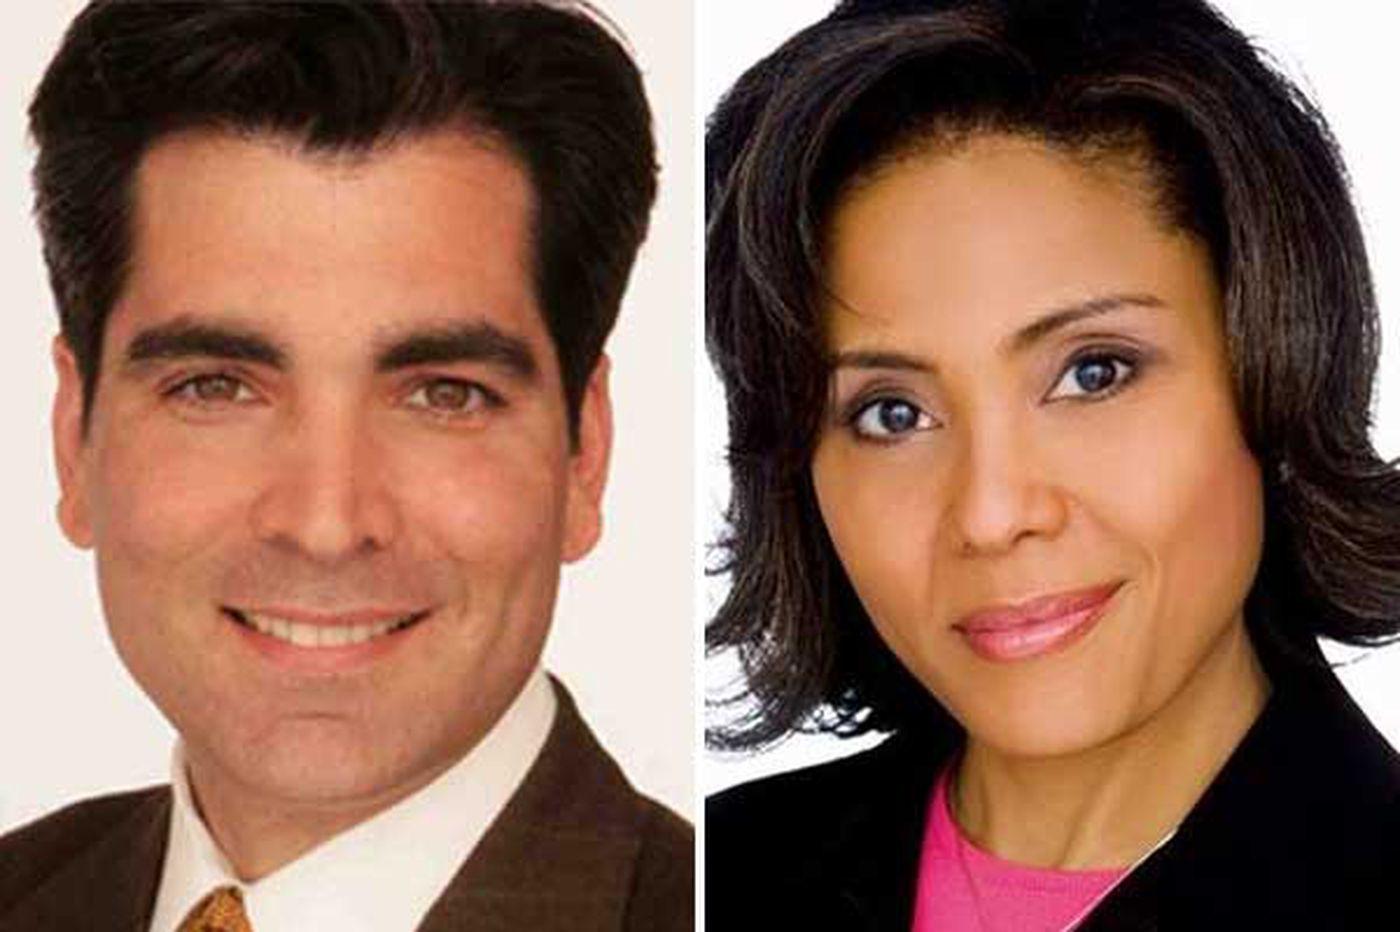 Former TV anchor loses N-word lawsuit